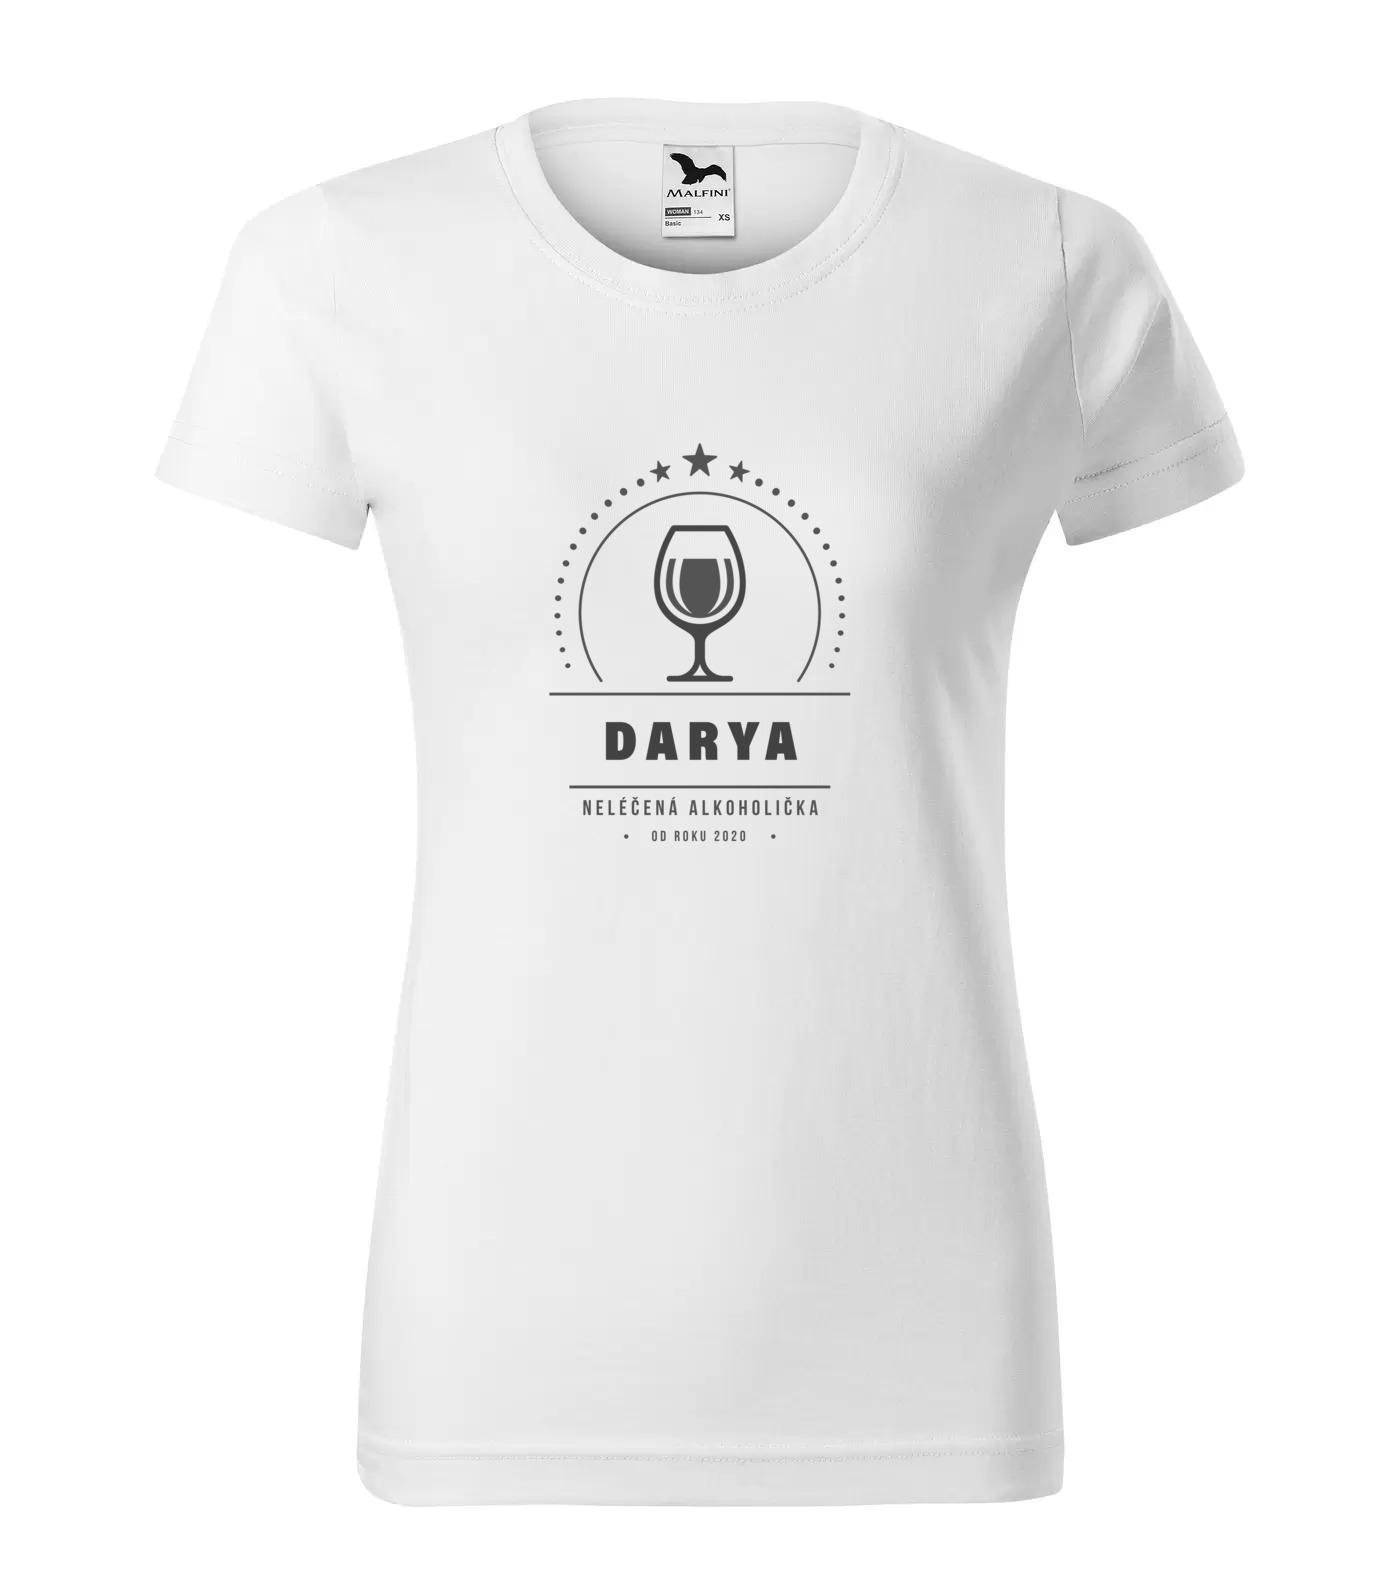 Tričko Alkoholička Darya